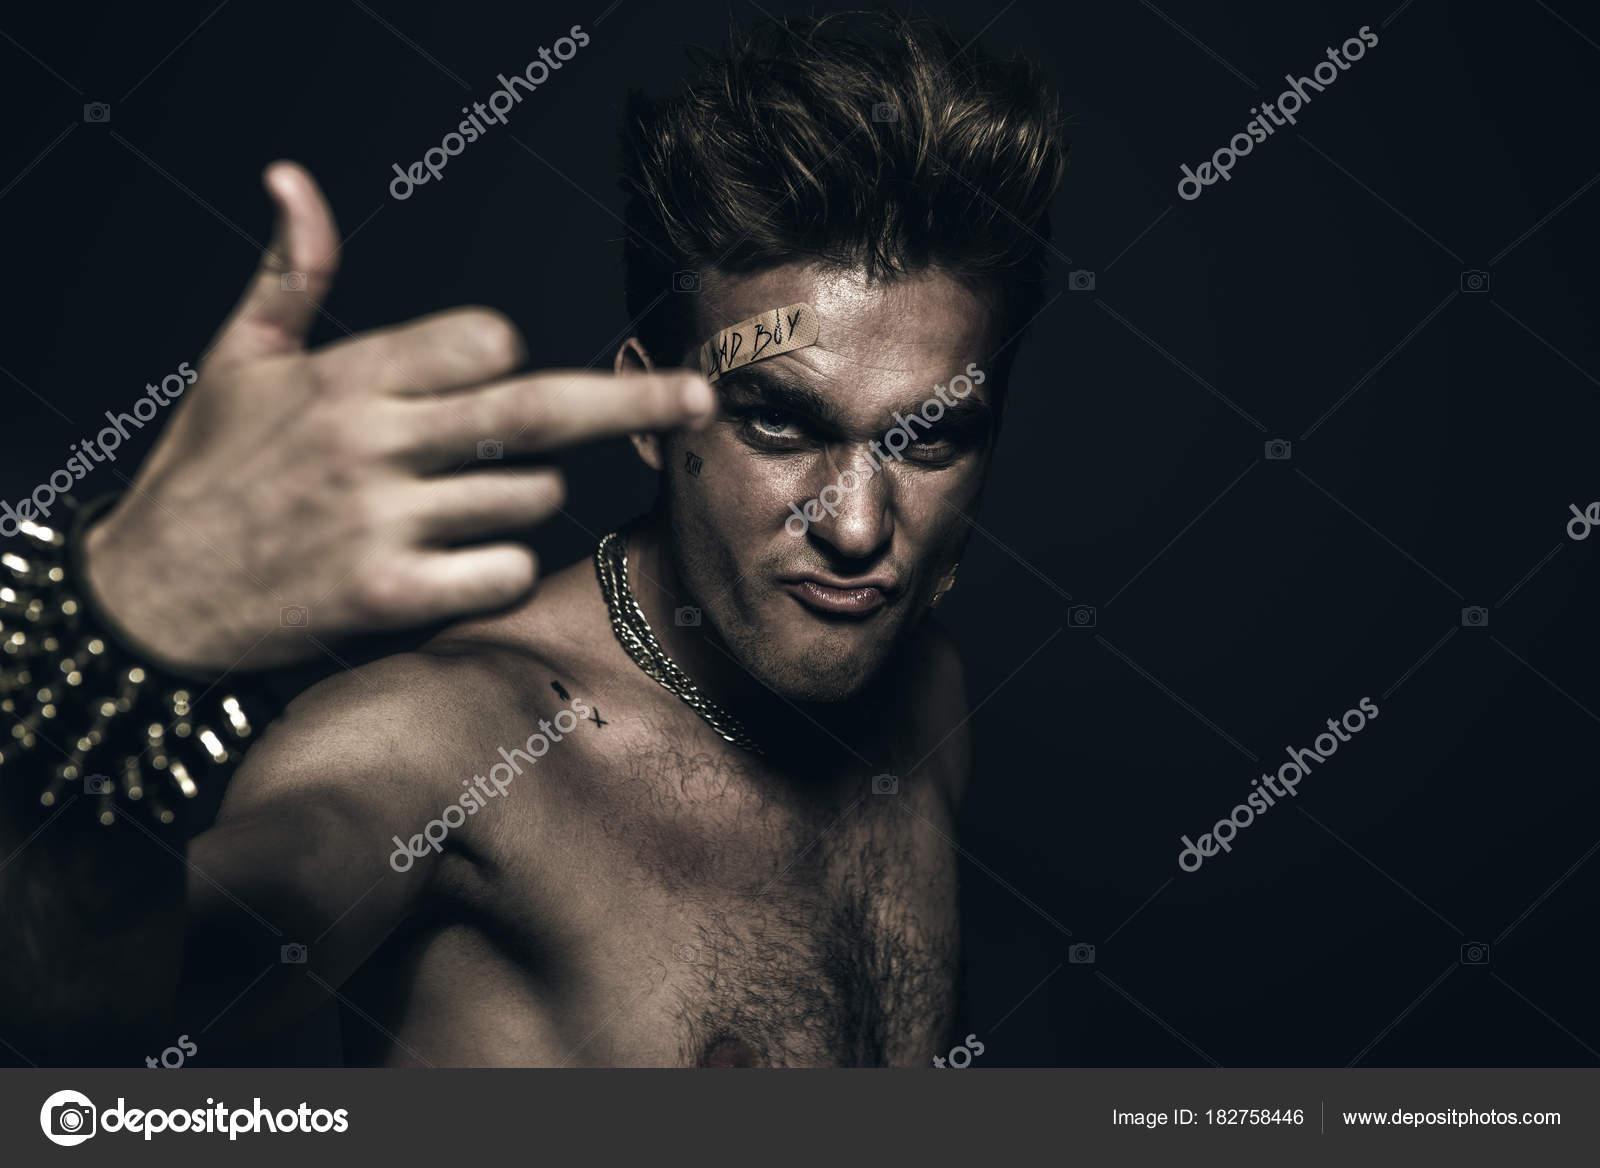 Concept Bad bad boy concept stock photo prometeus 182758446